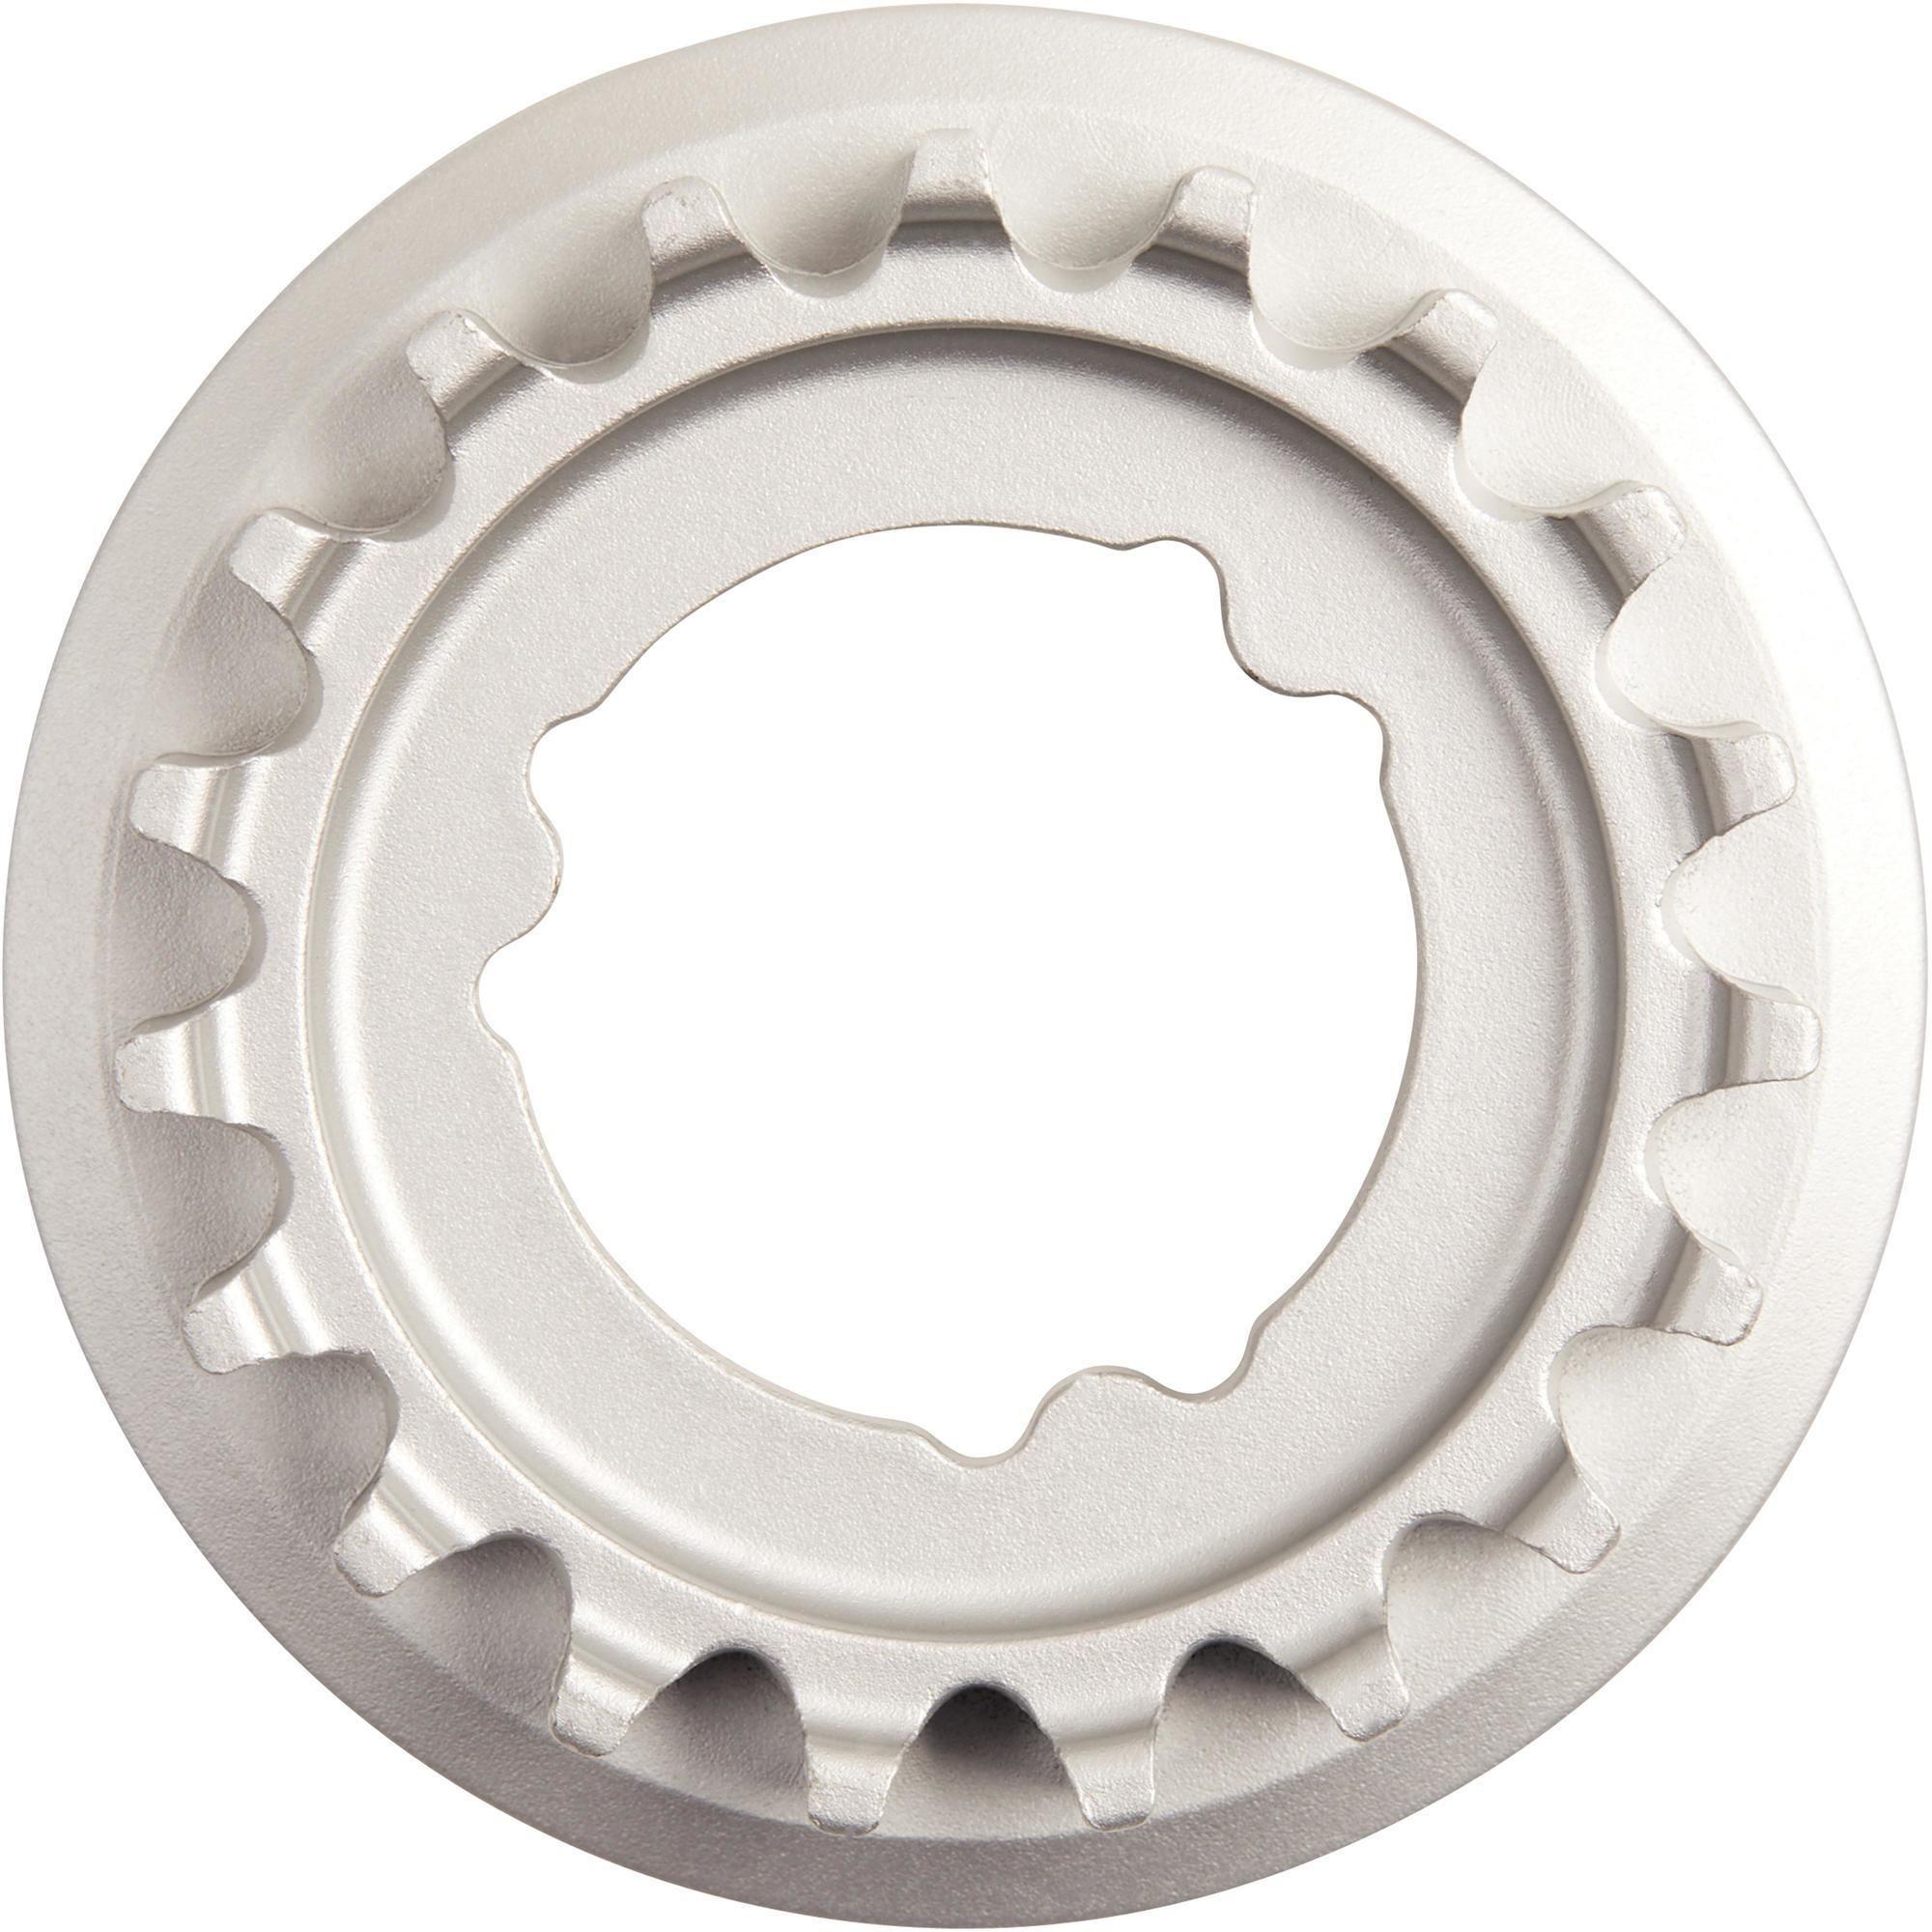 Zębatka metal 11 mm 19